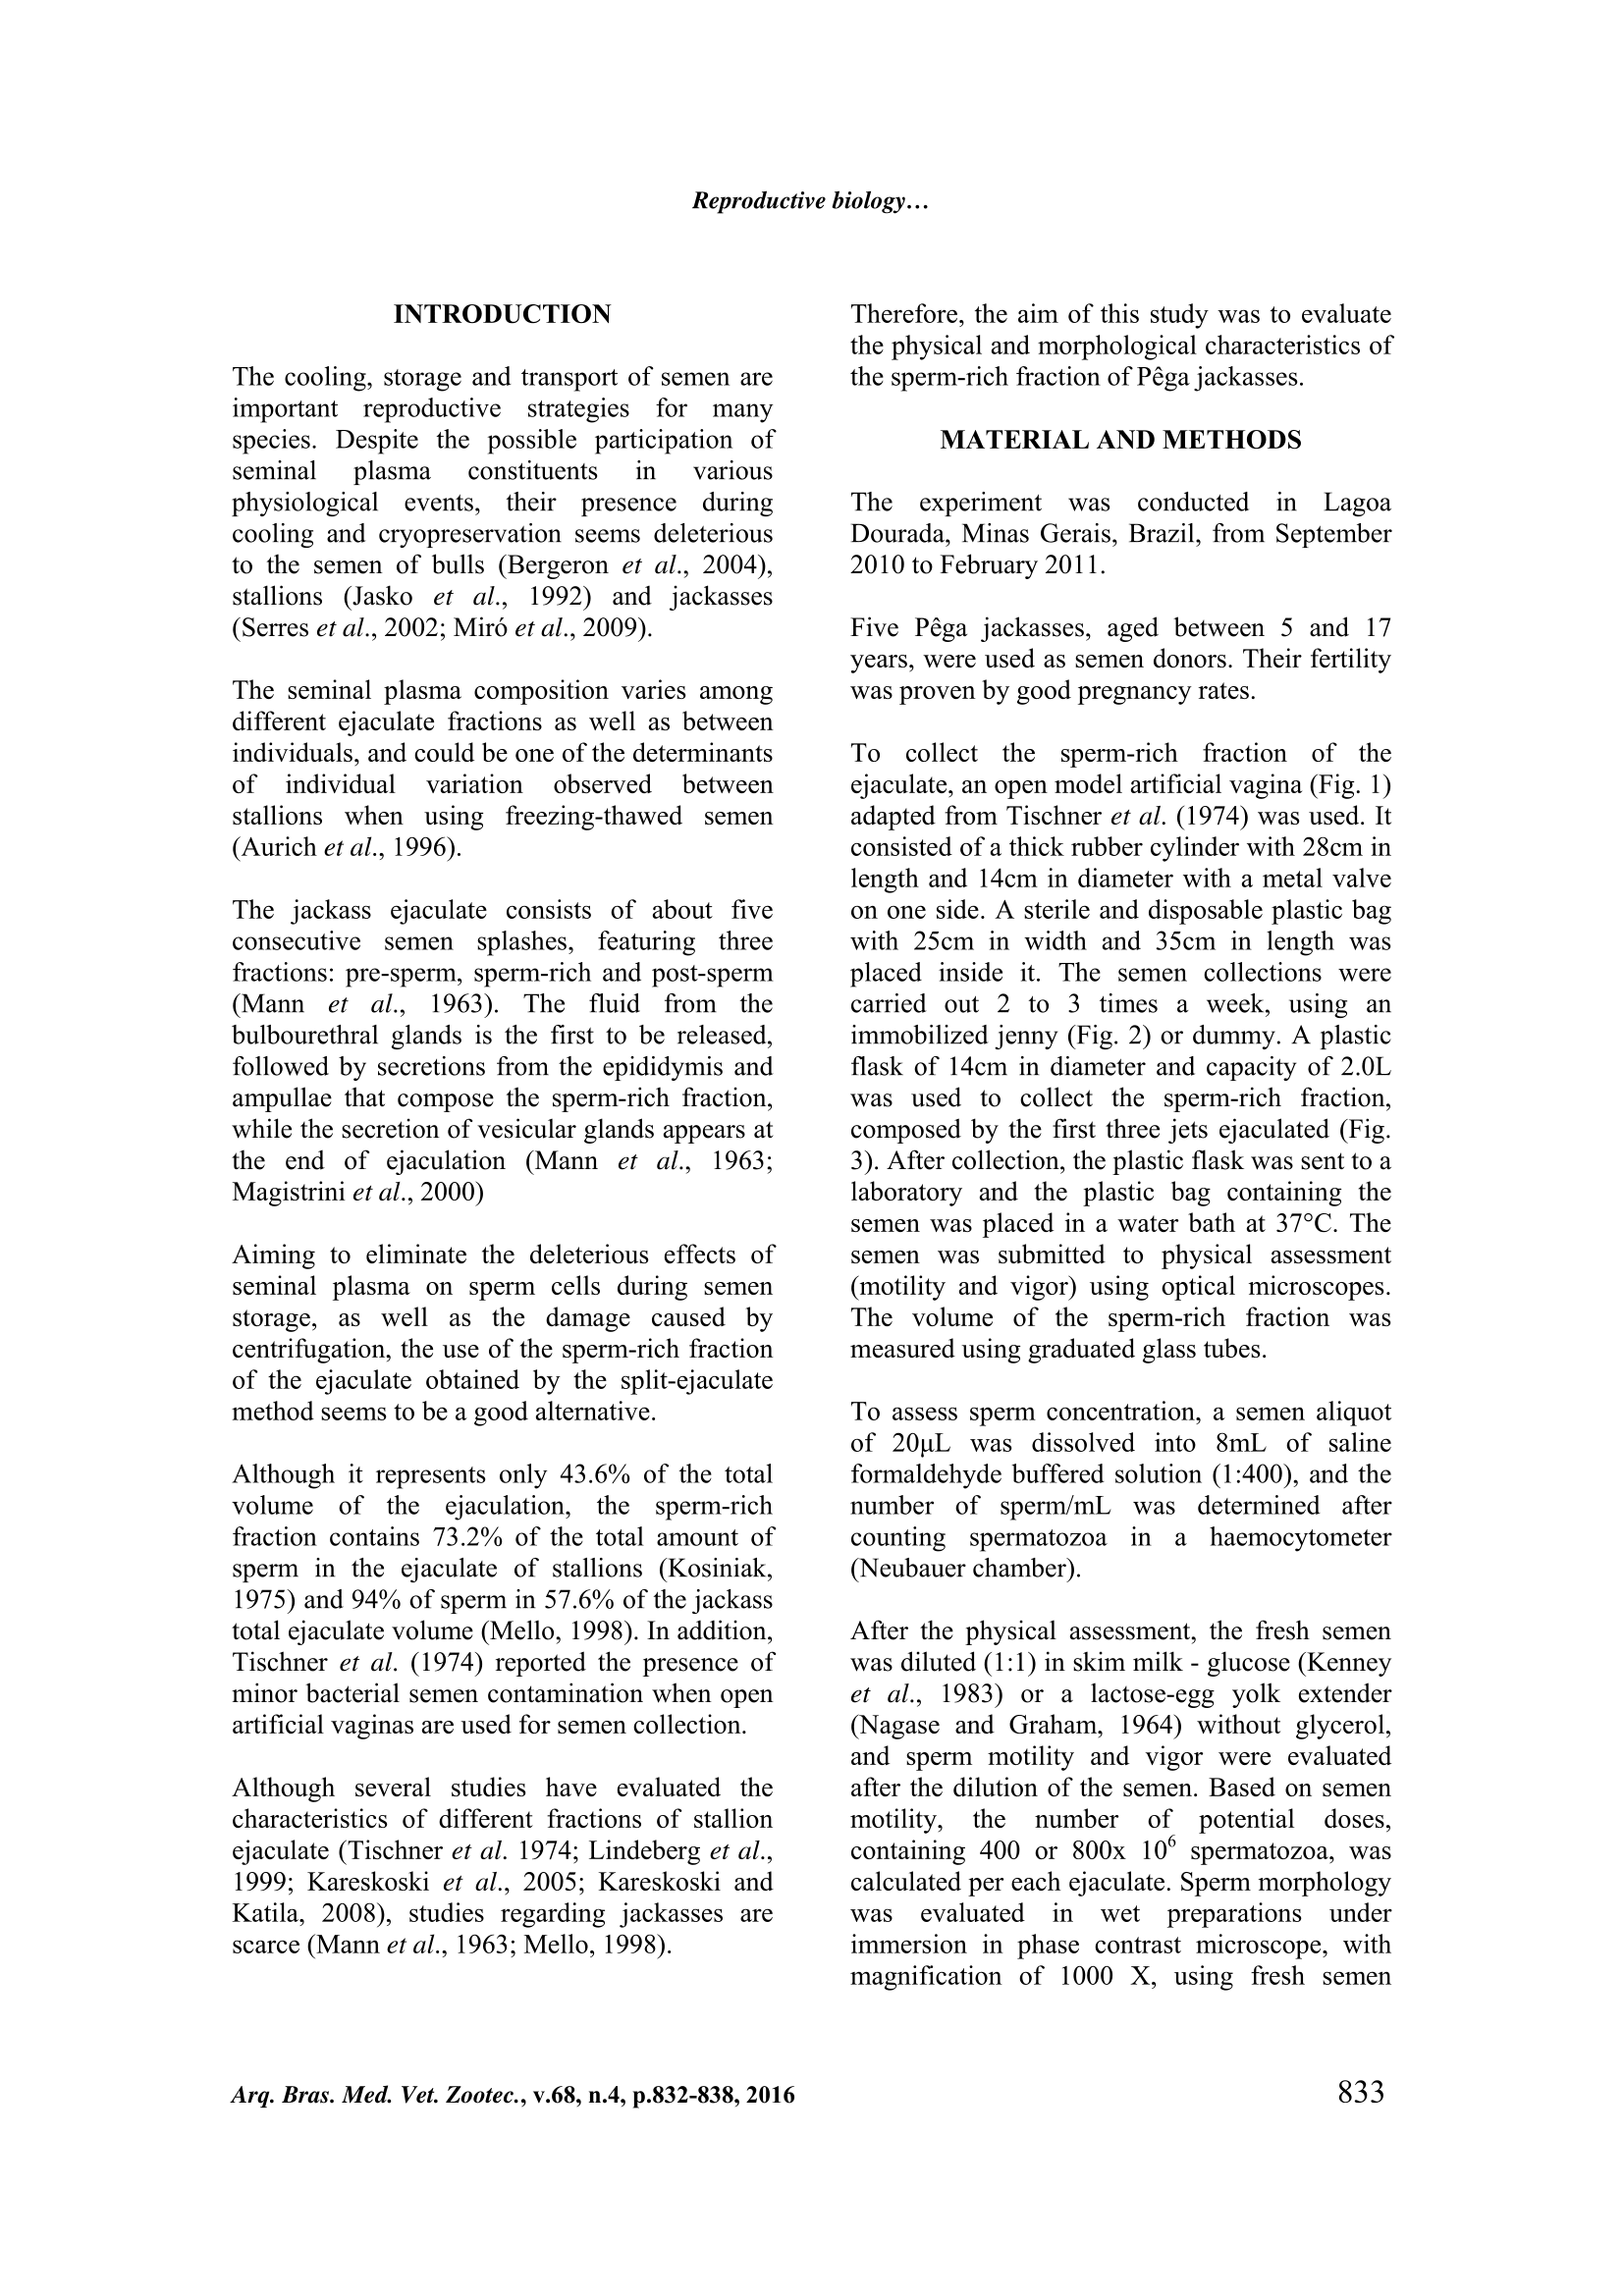 AMA 1-2 (1).png